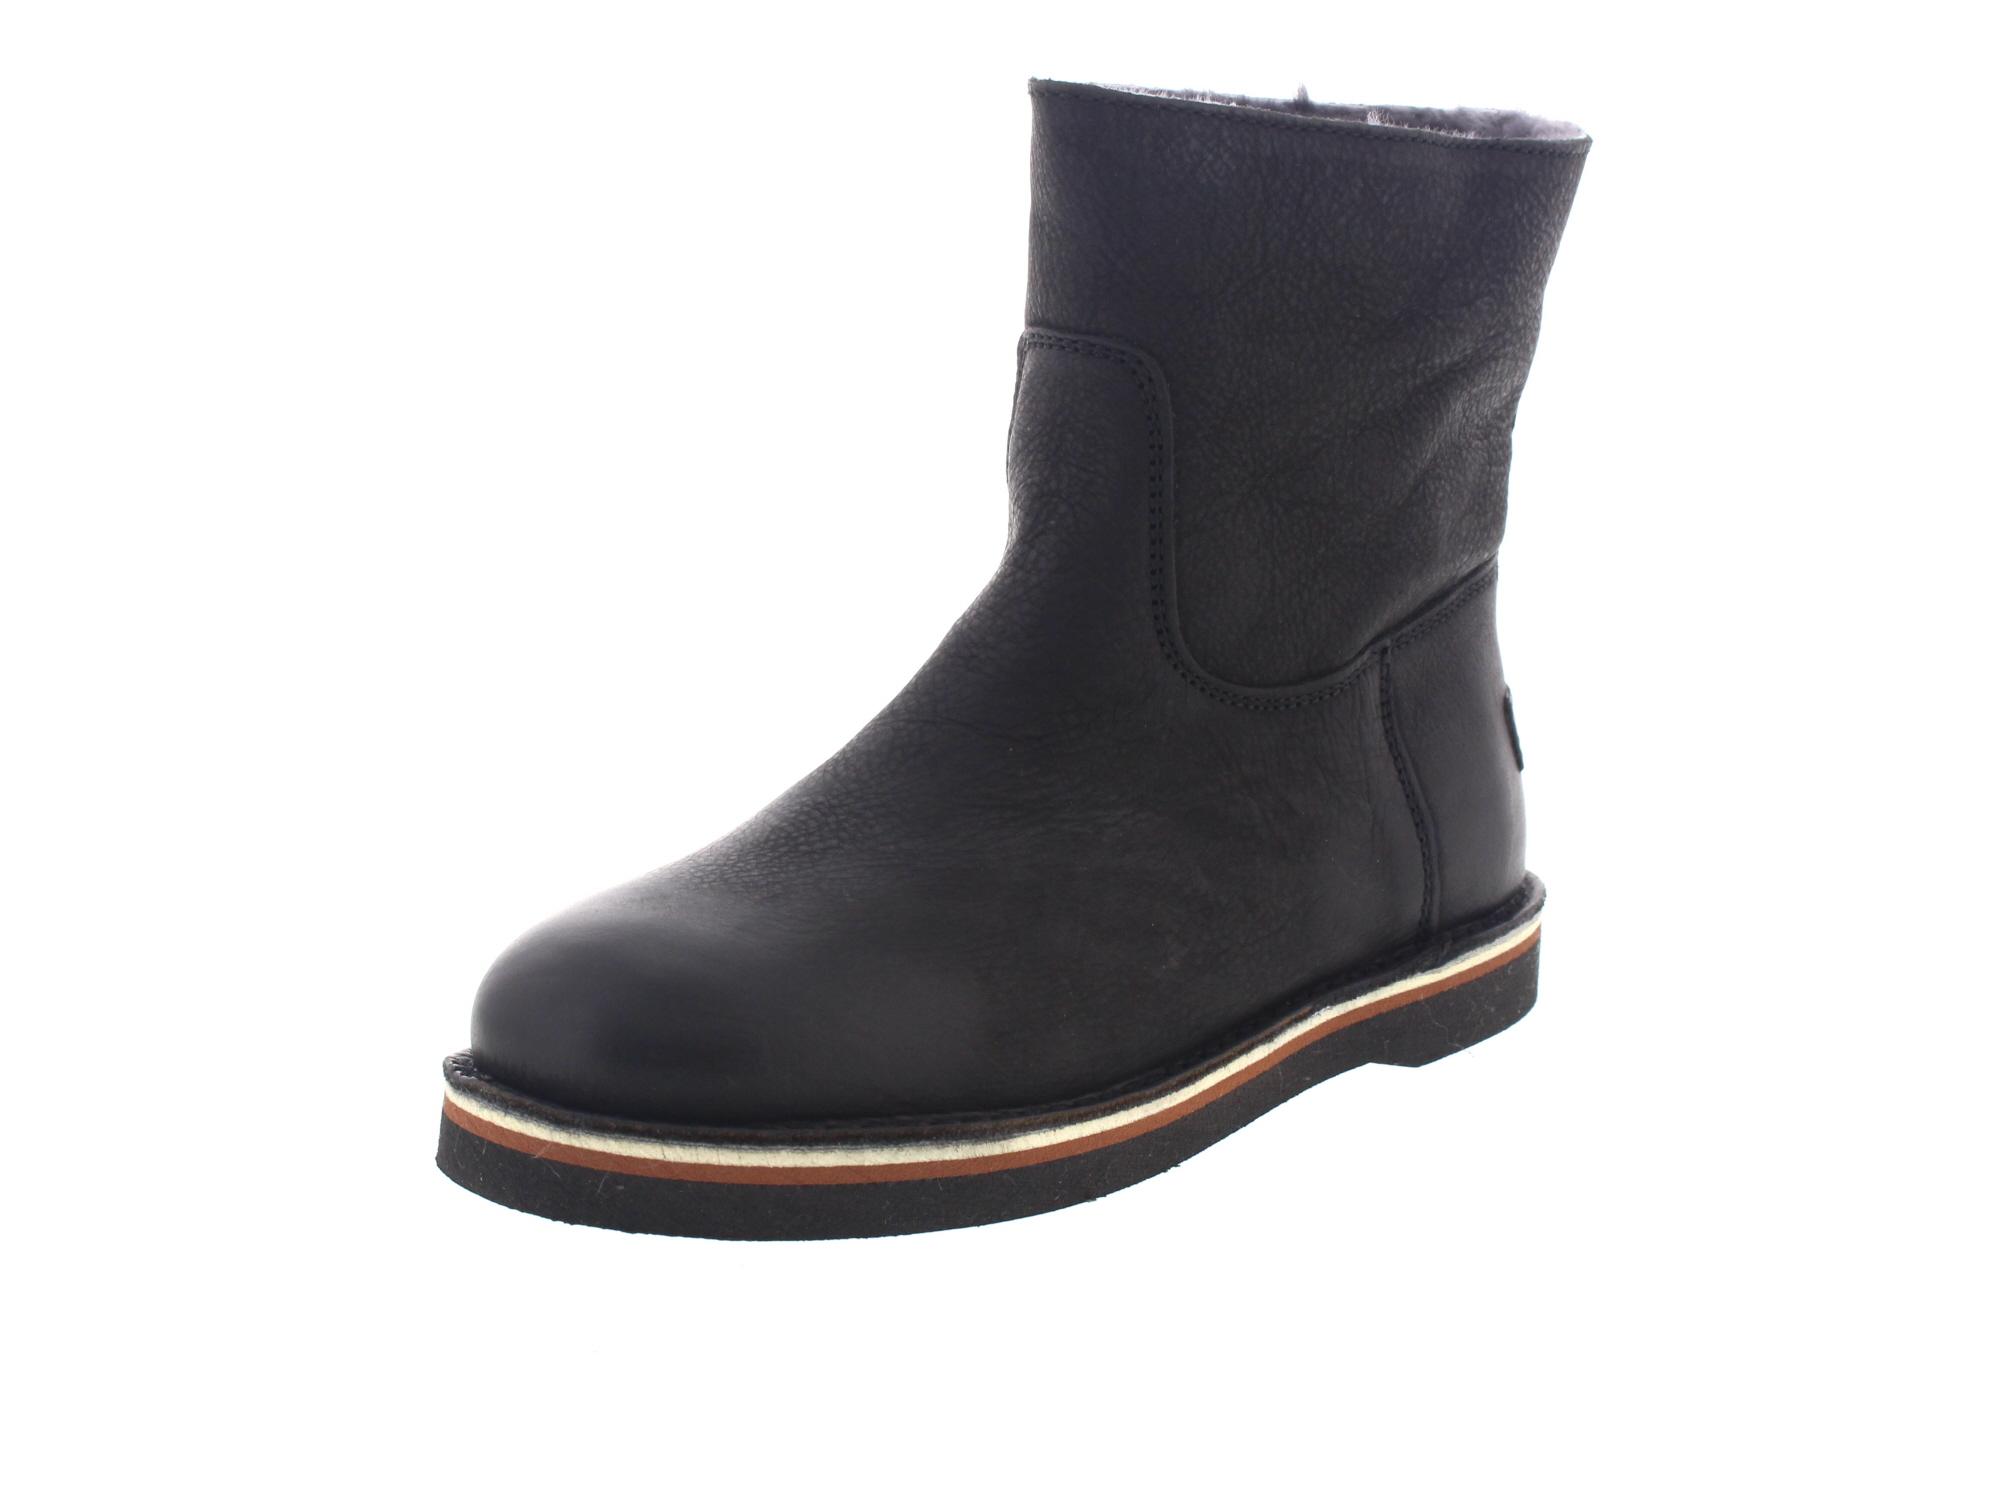 SHABBIES AMSTERDAM Schuhe Siefeletten 202082 - black-0